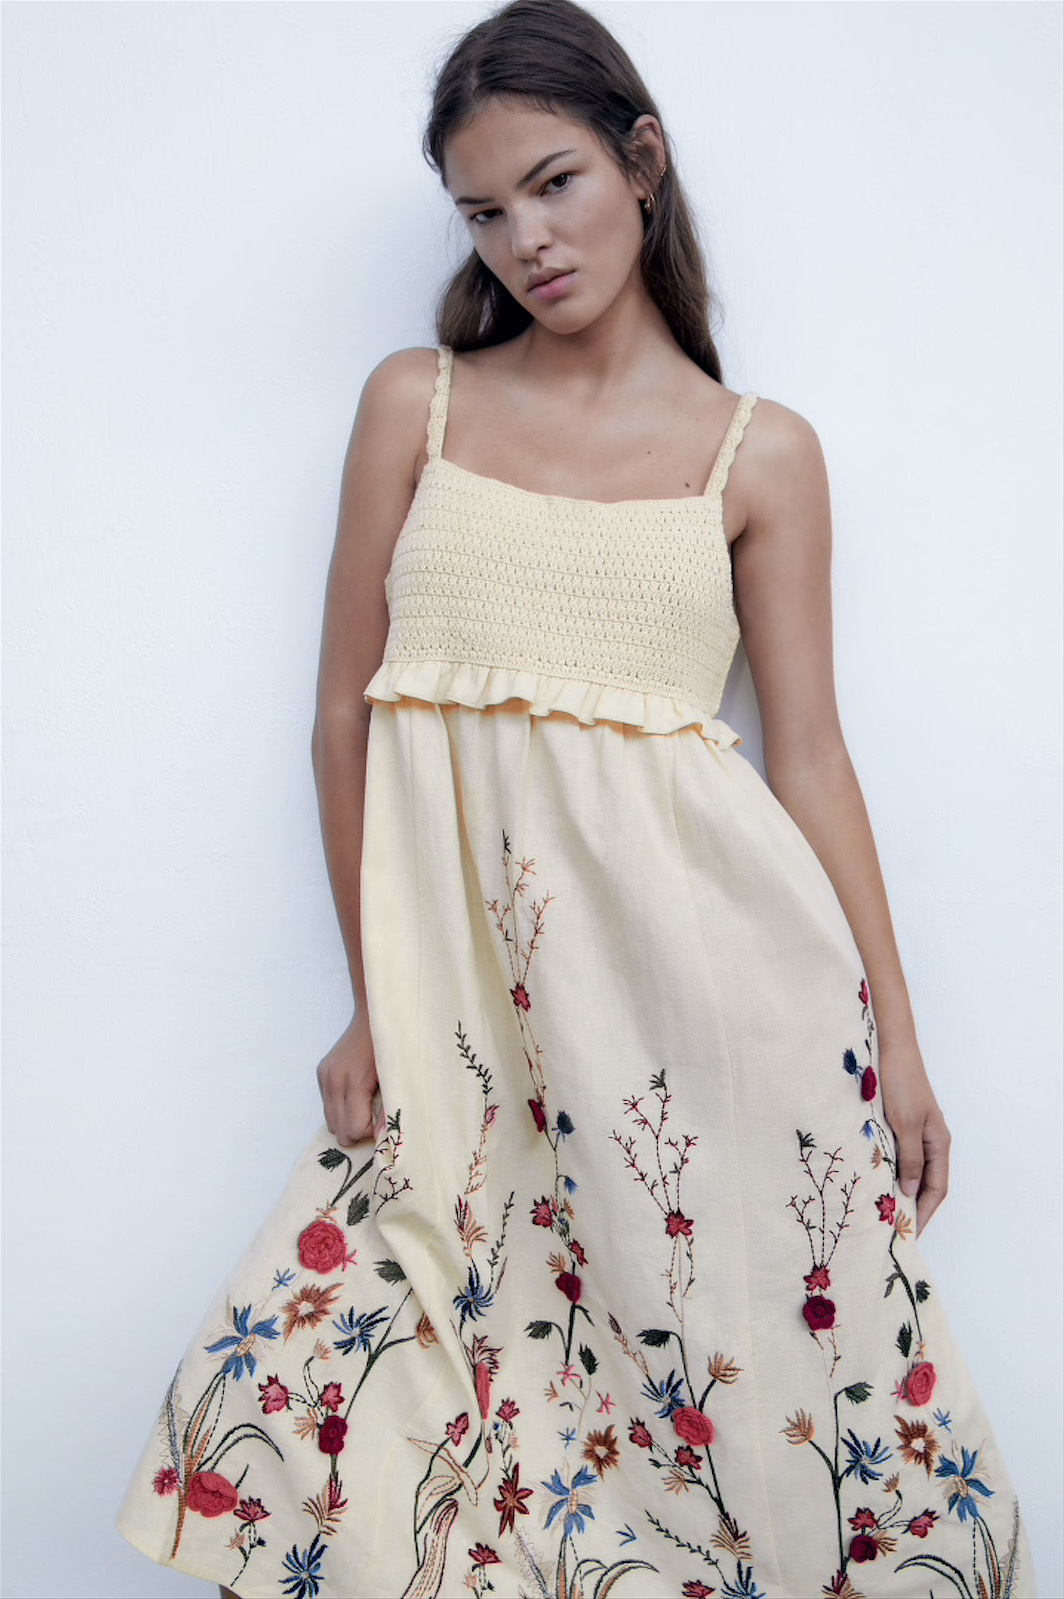 Vestido con flores bordadas de Zara.